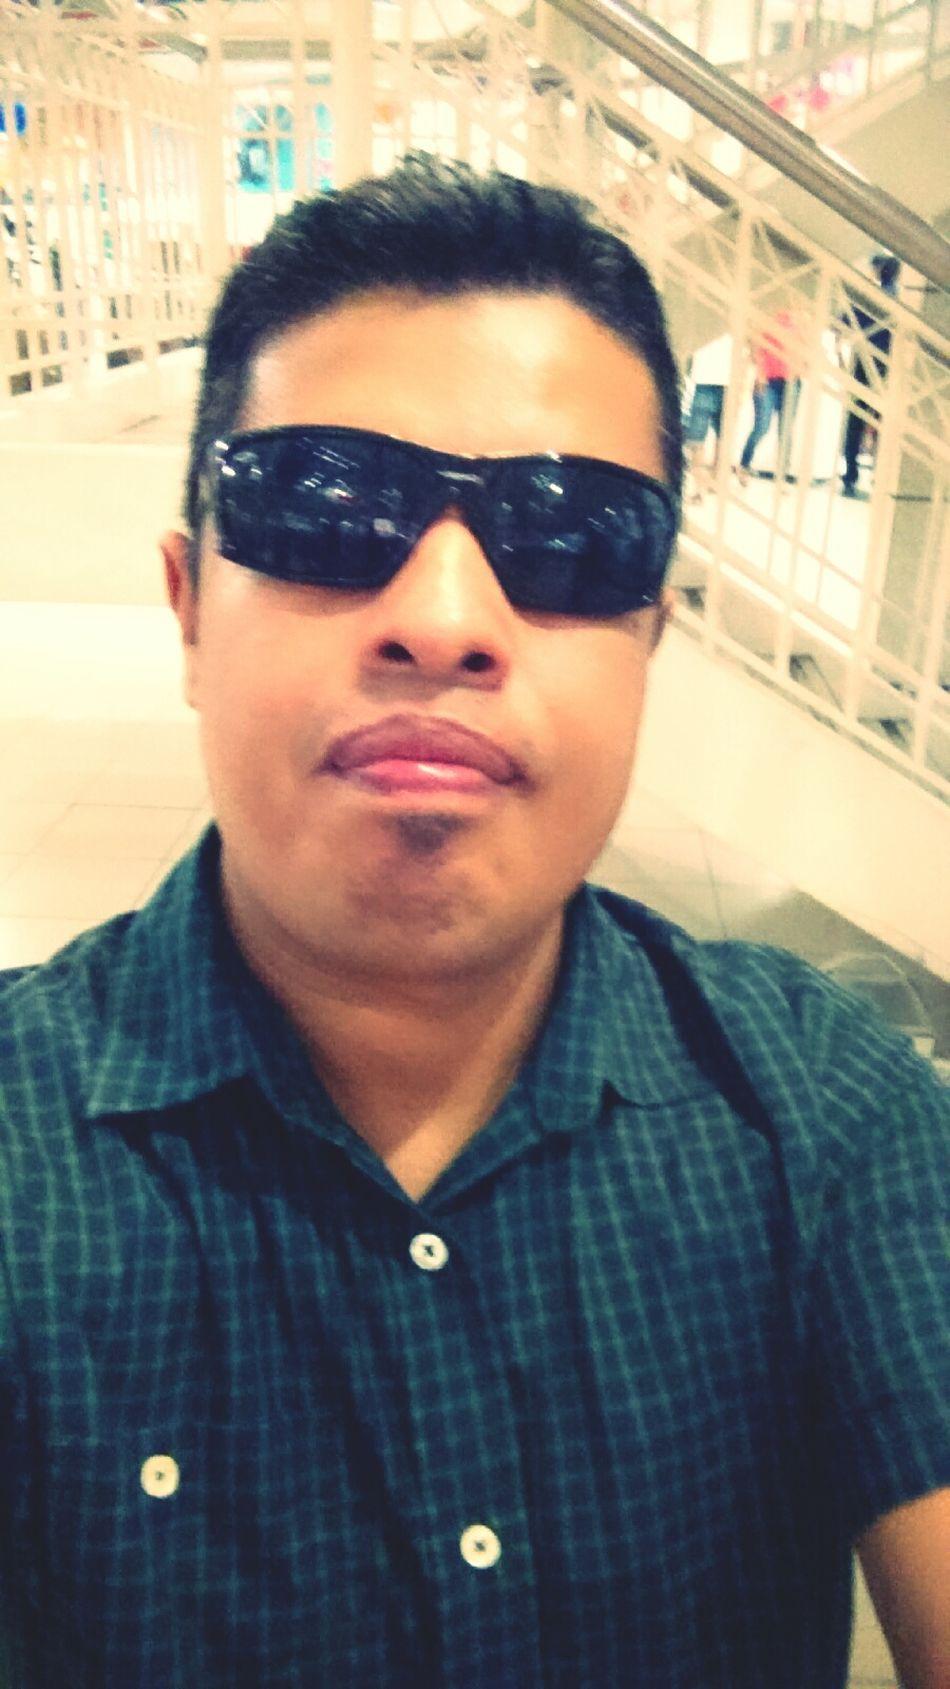 Fortaleza Selfie Model Ceará